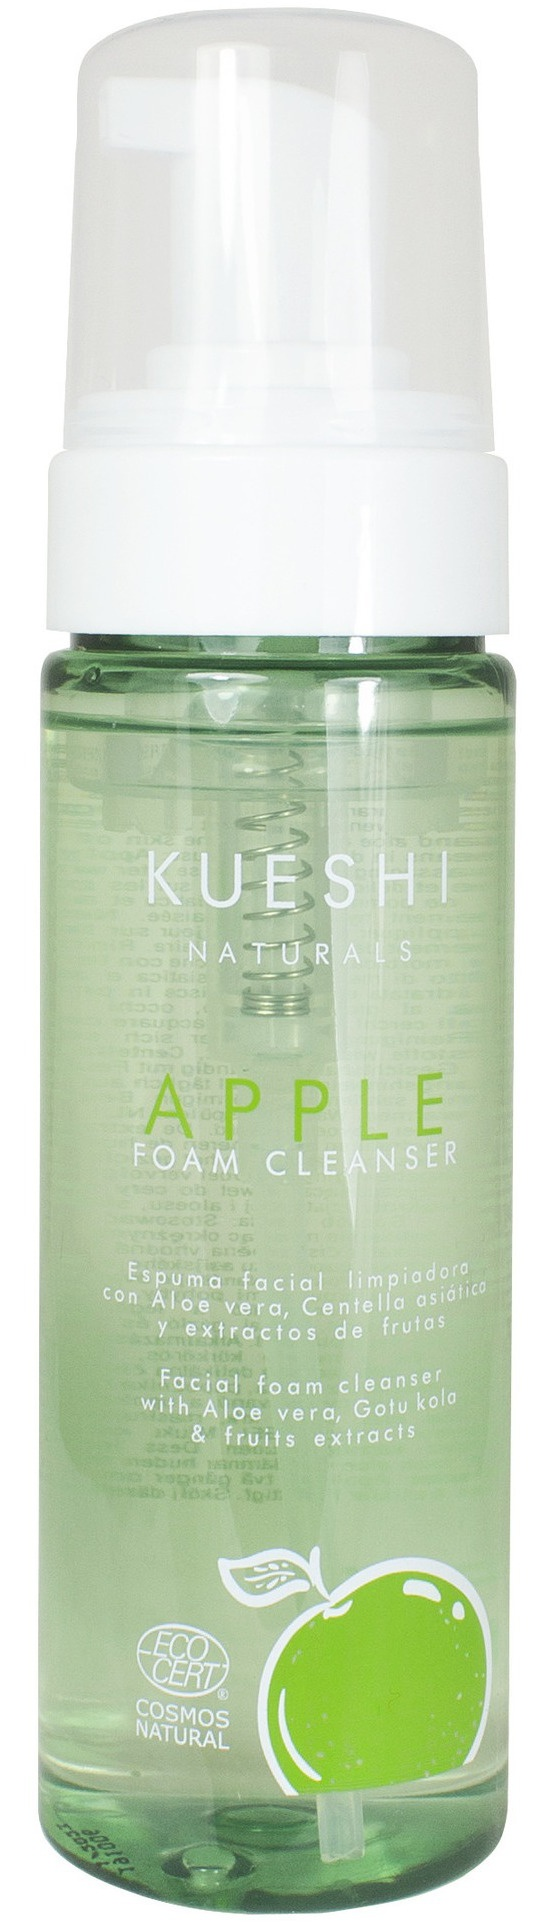 KUESHI NATURALS Apple Foam Cleanser